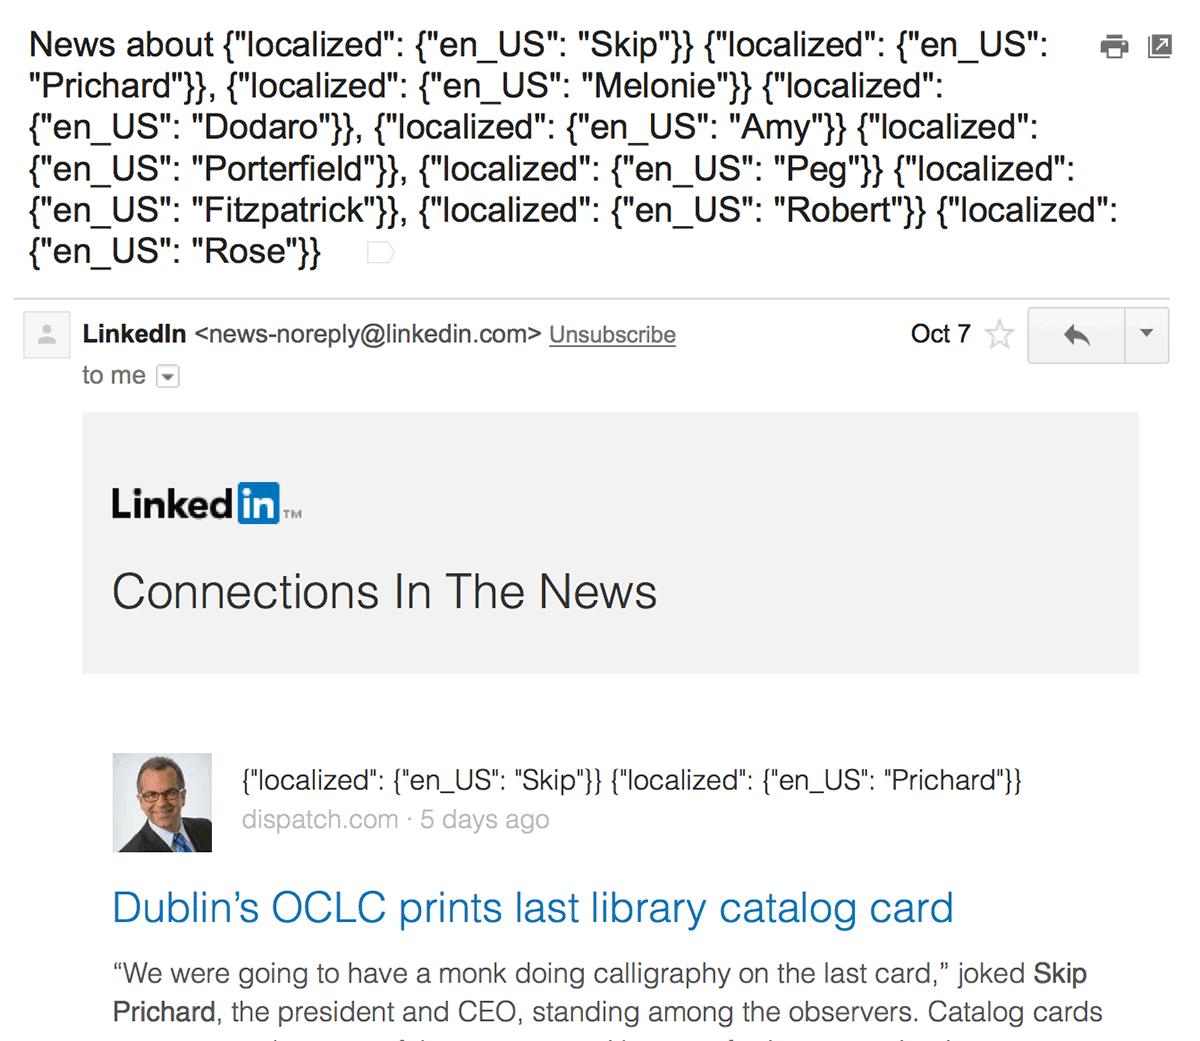 LinkedInBotchedSubjectLine